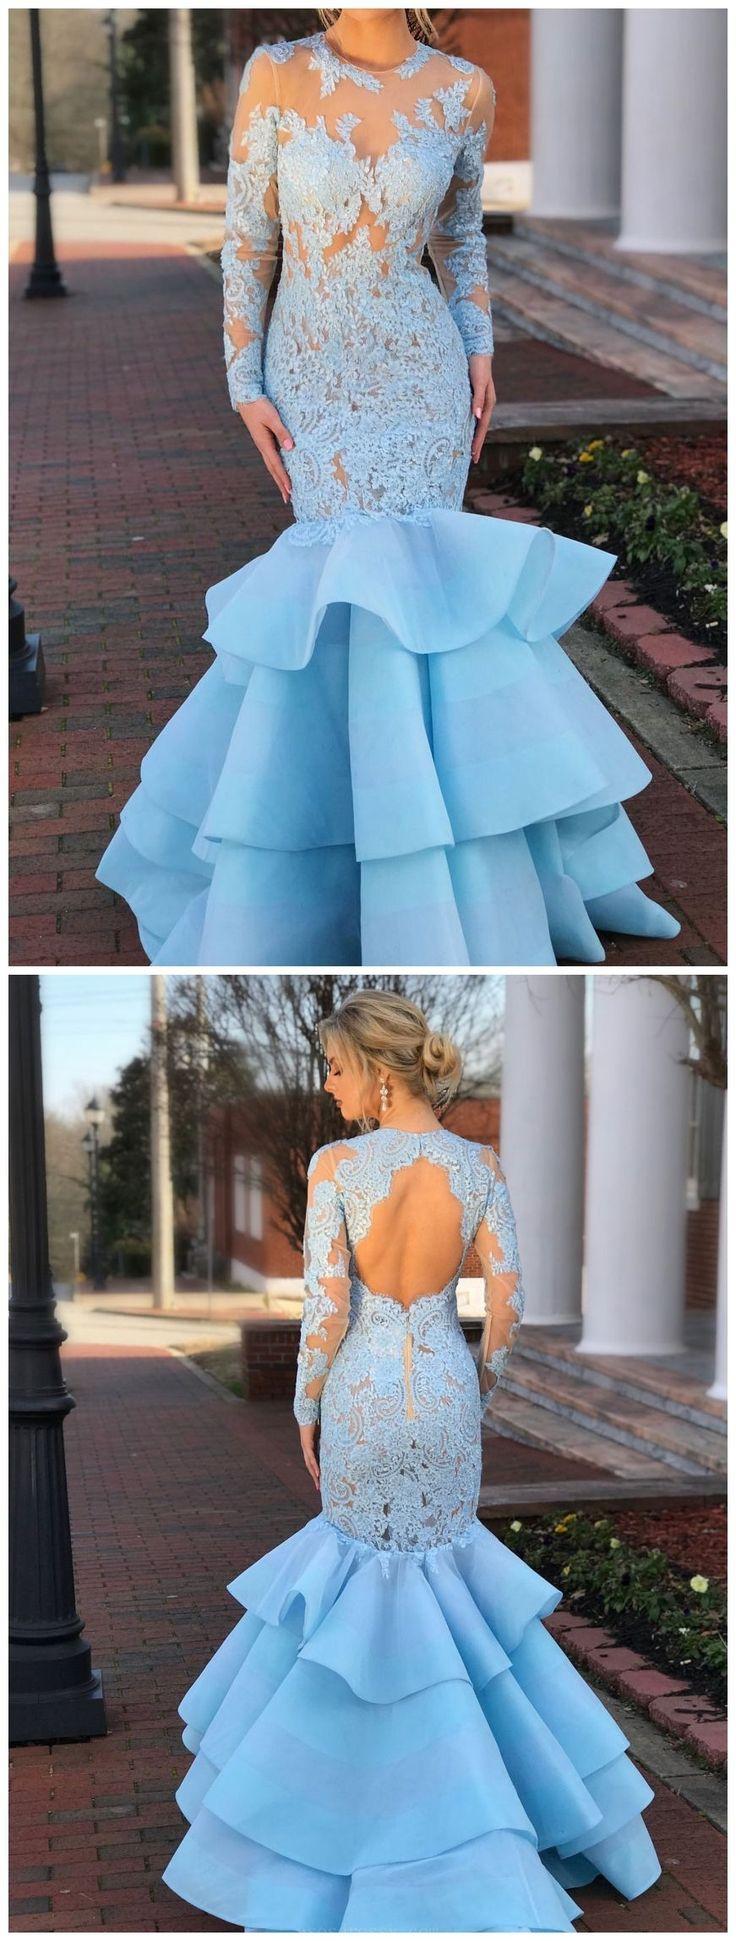 best dresses i want images on pinterest classy dress formal